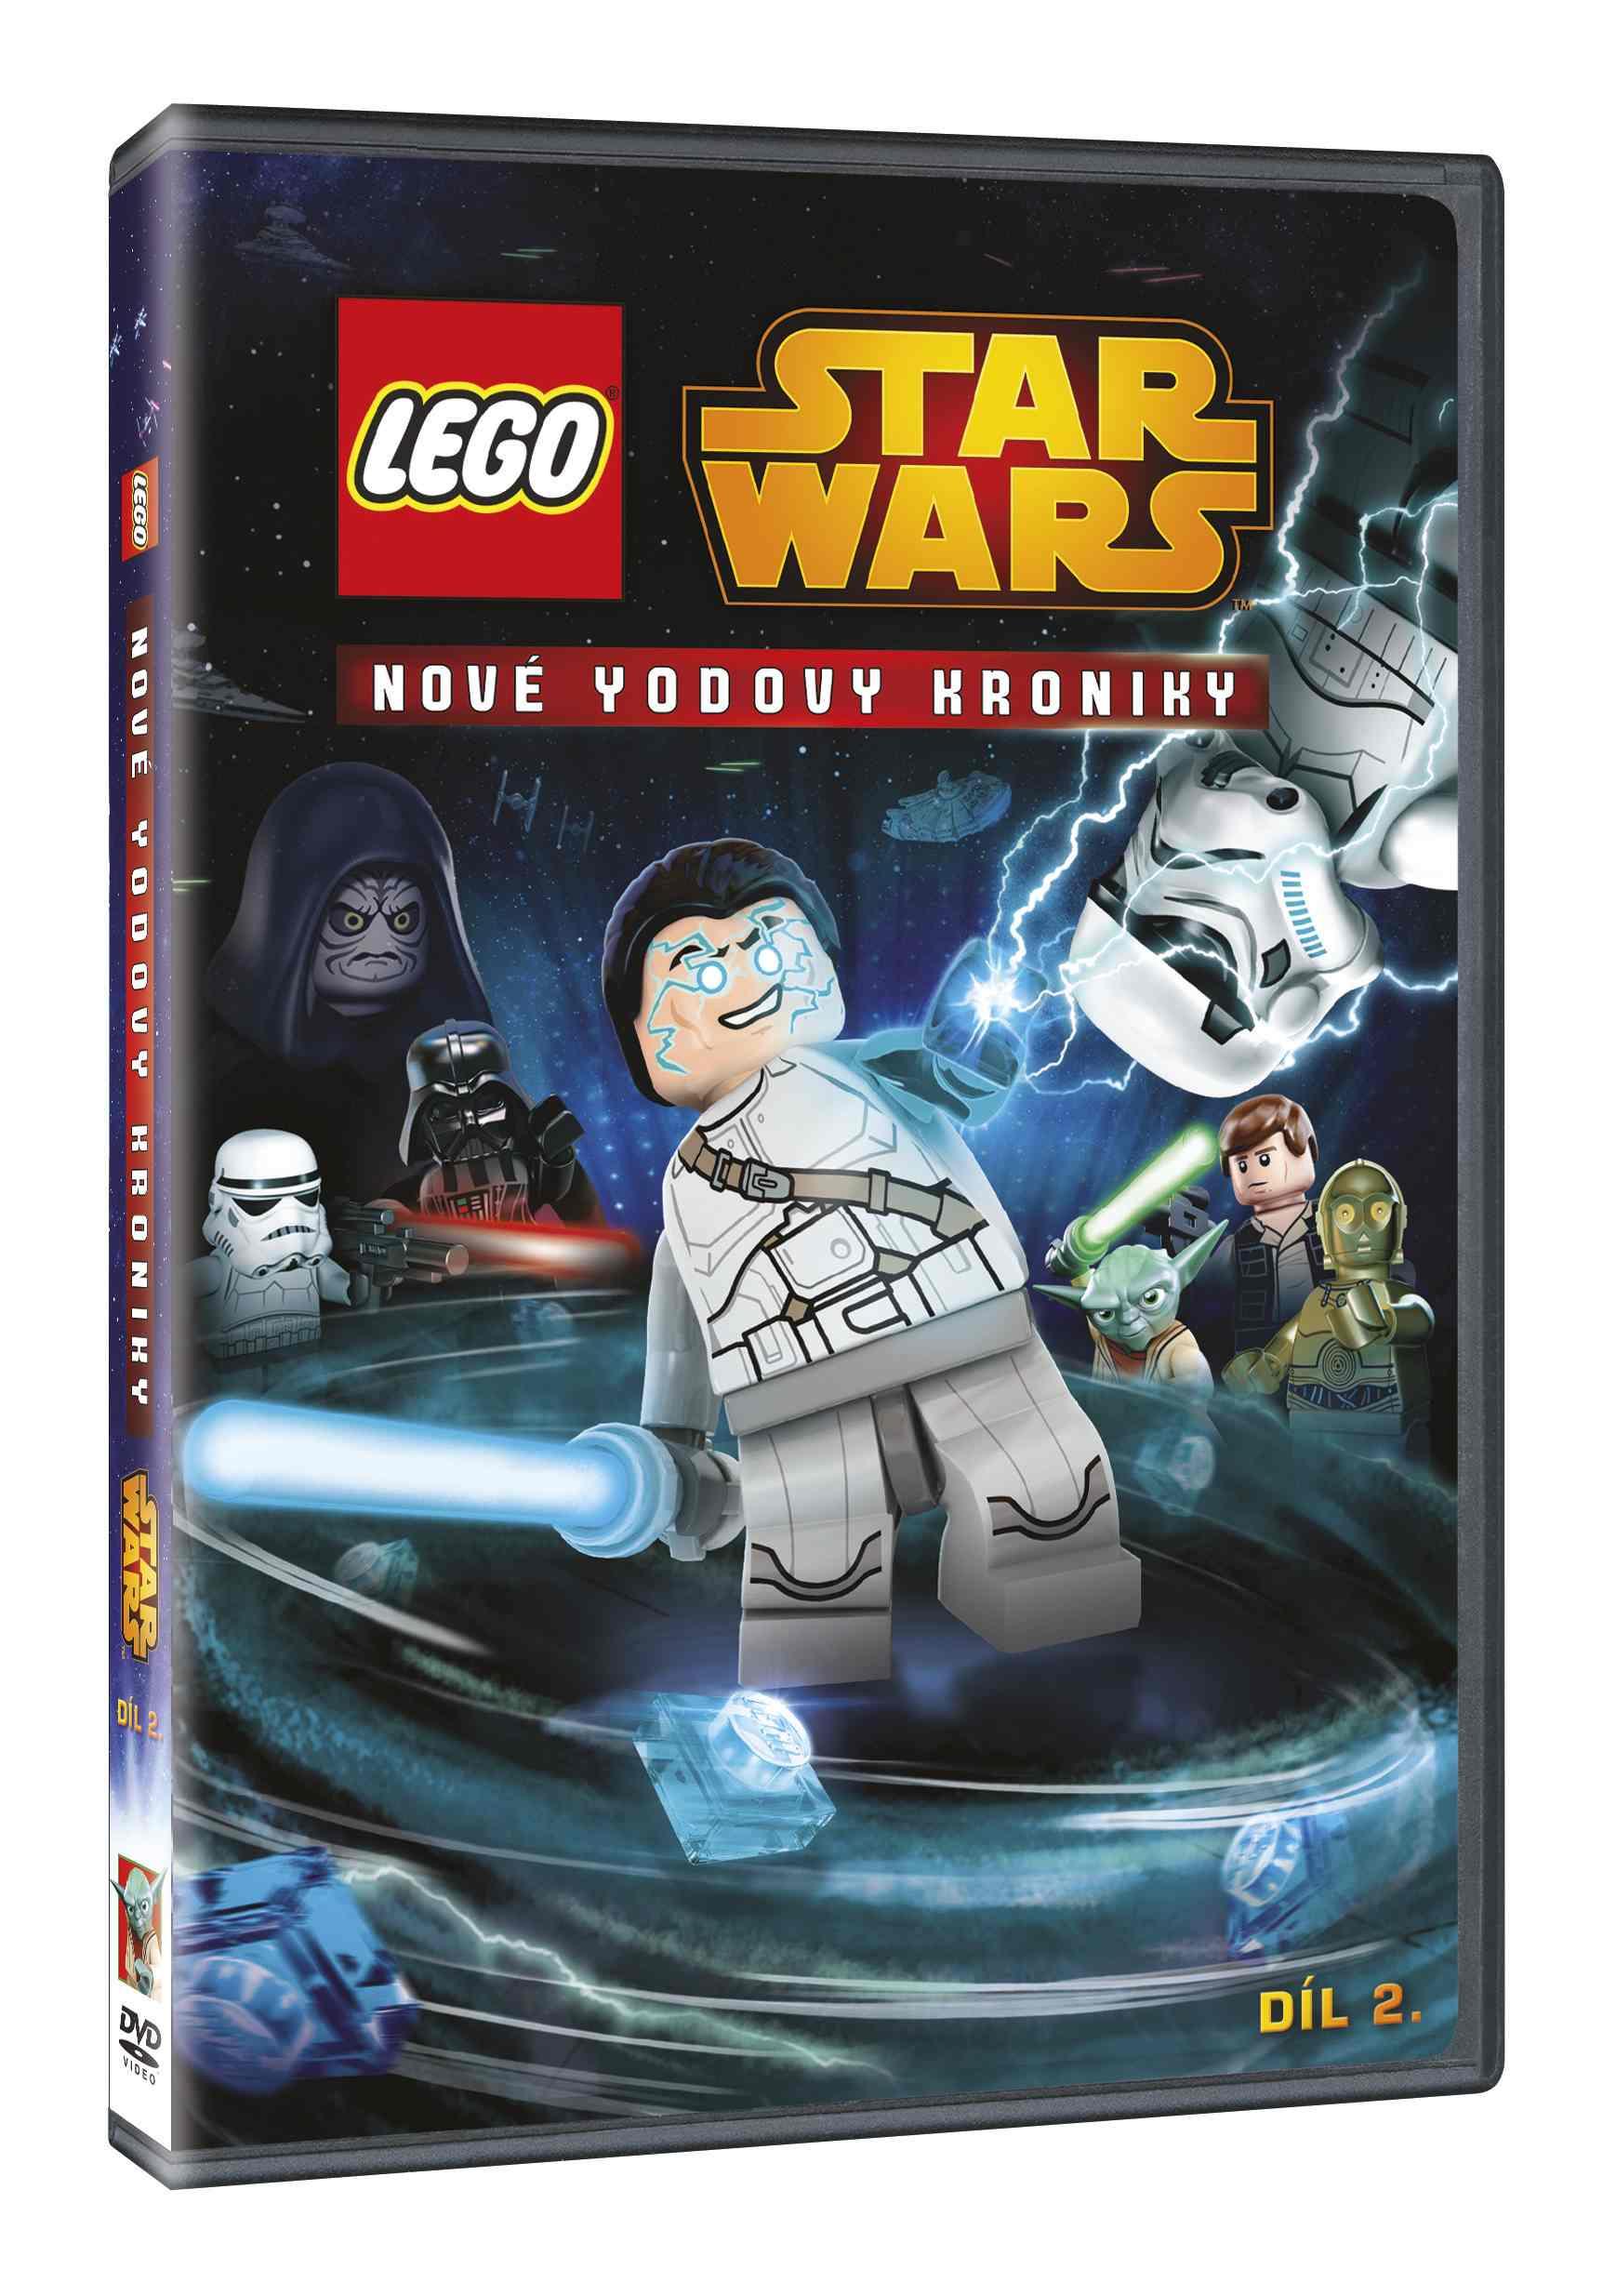 LEGO STAR WARS: NOVÉ YODOVY KRONIKY 2 - DVD